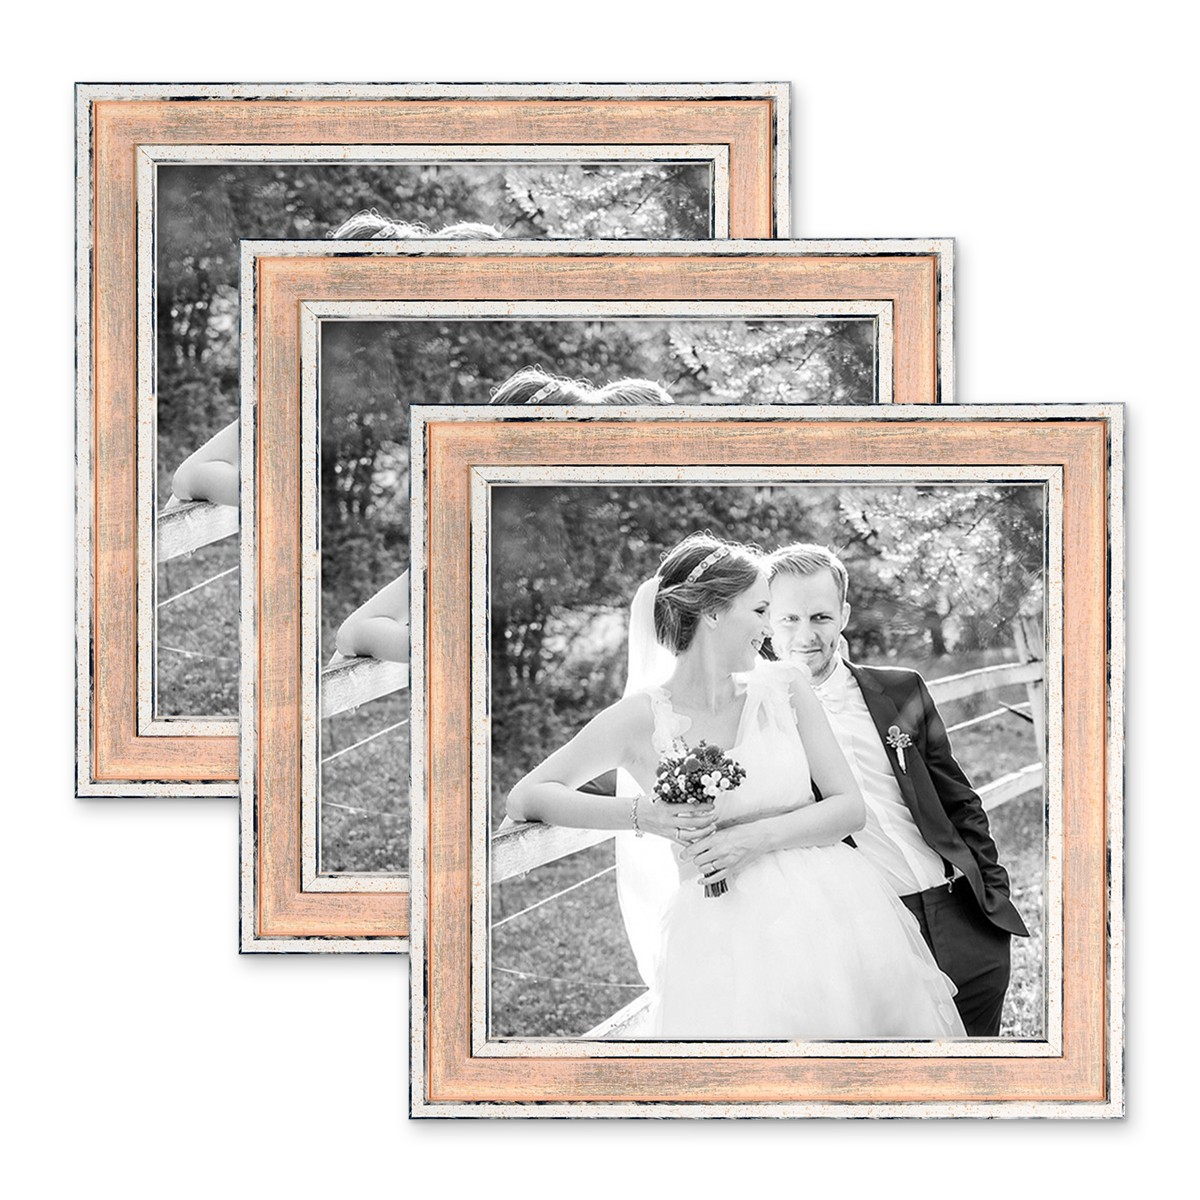 3er Set Bilderrahmen Pastell / Alt-Weiß Rosa 20x20 cm Massivholz mit ...